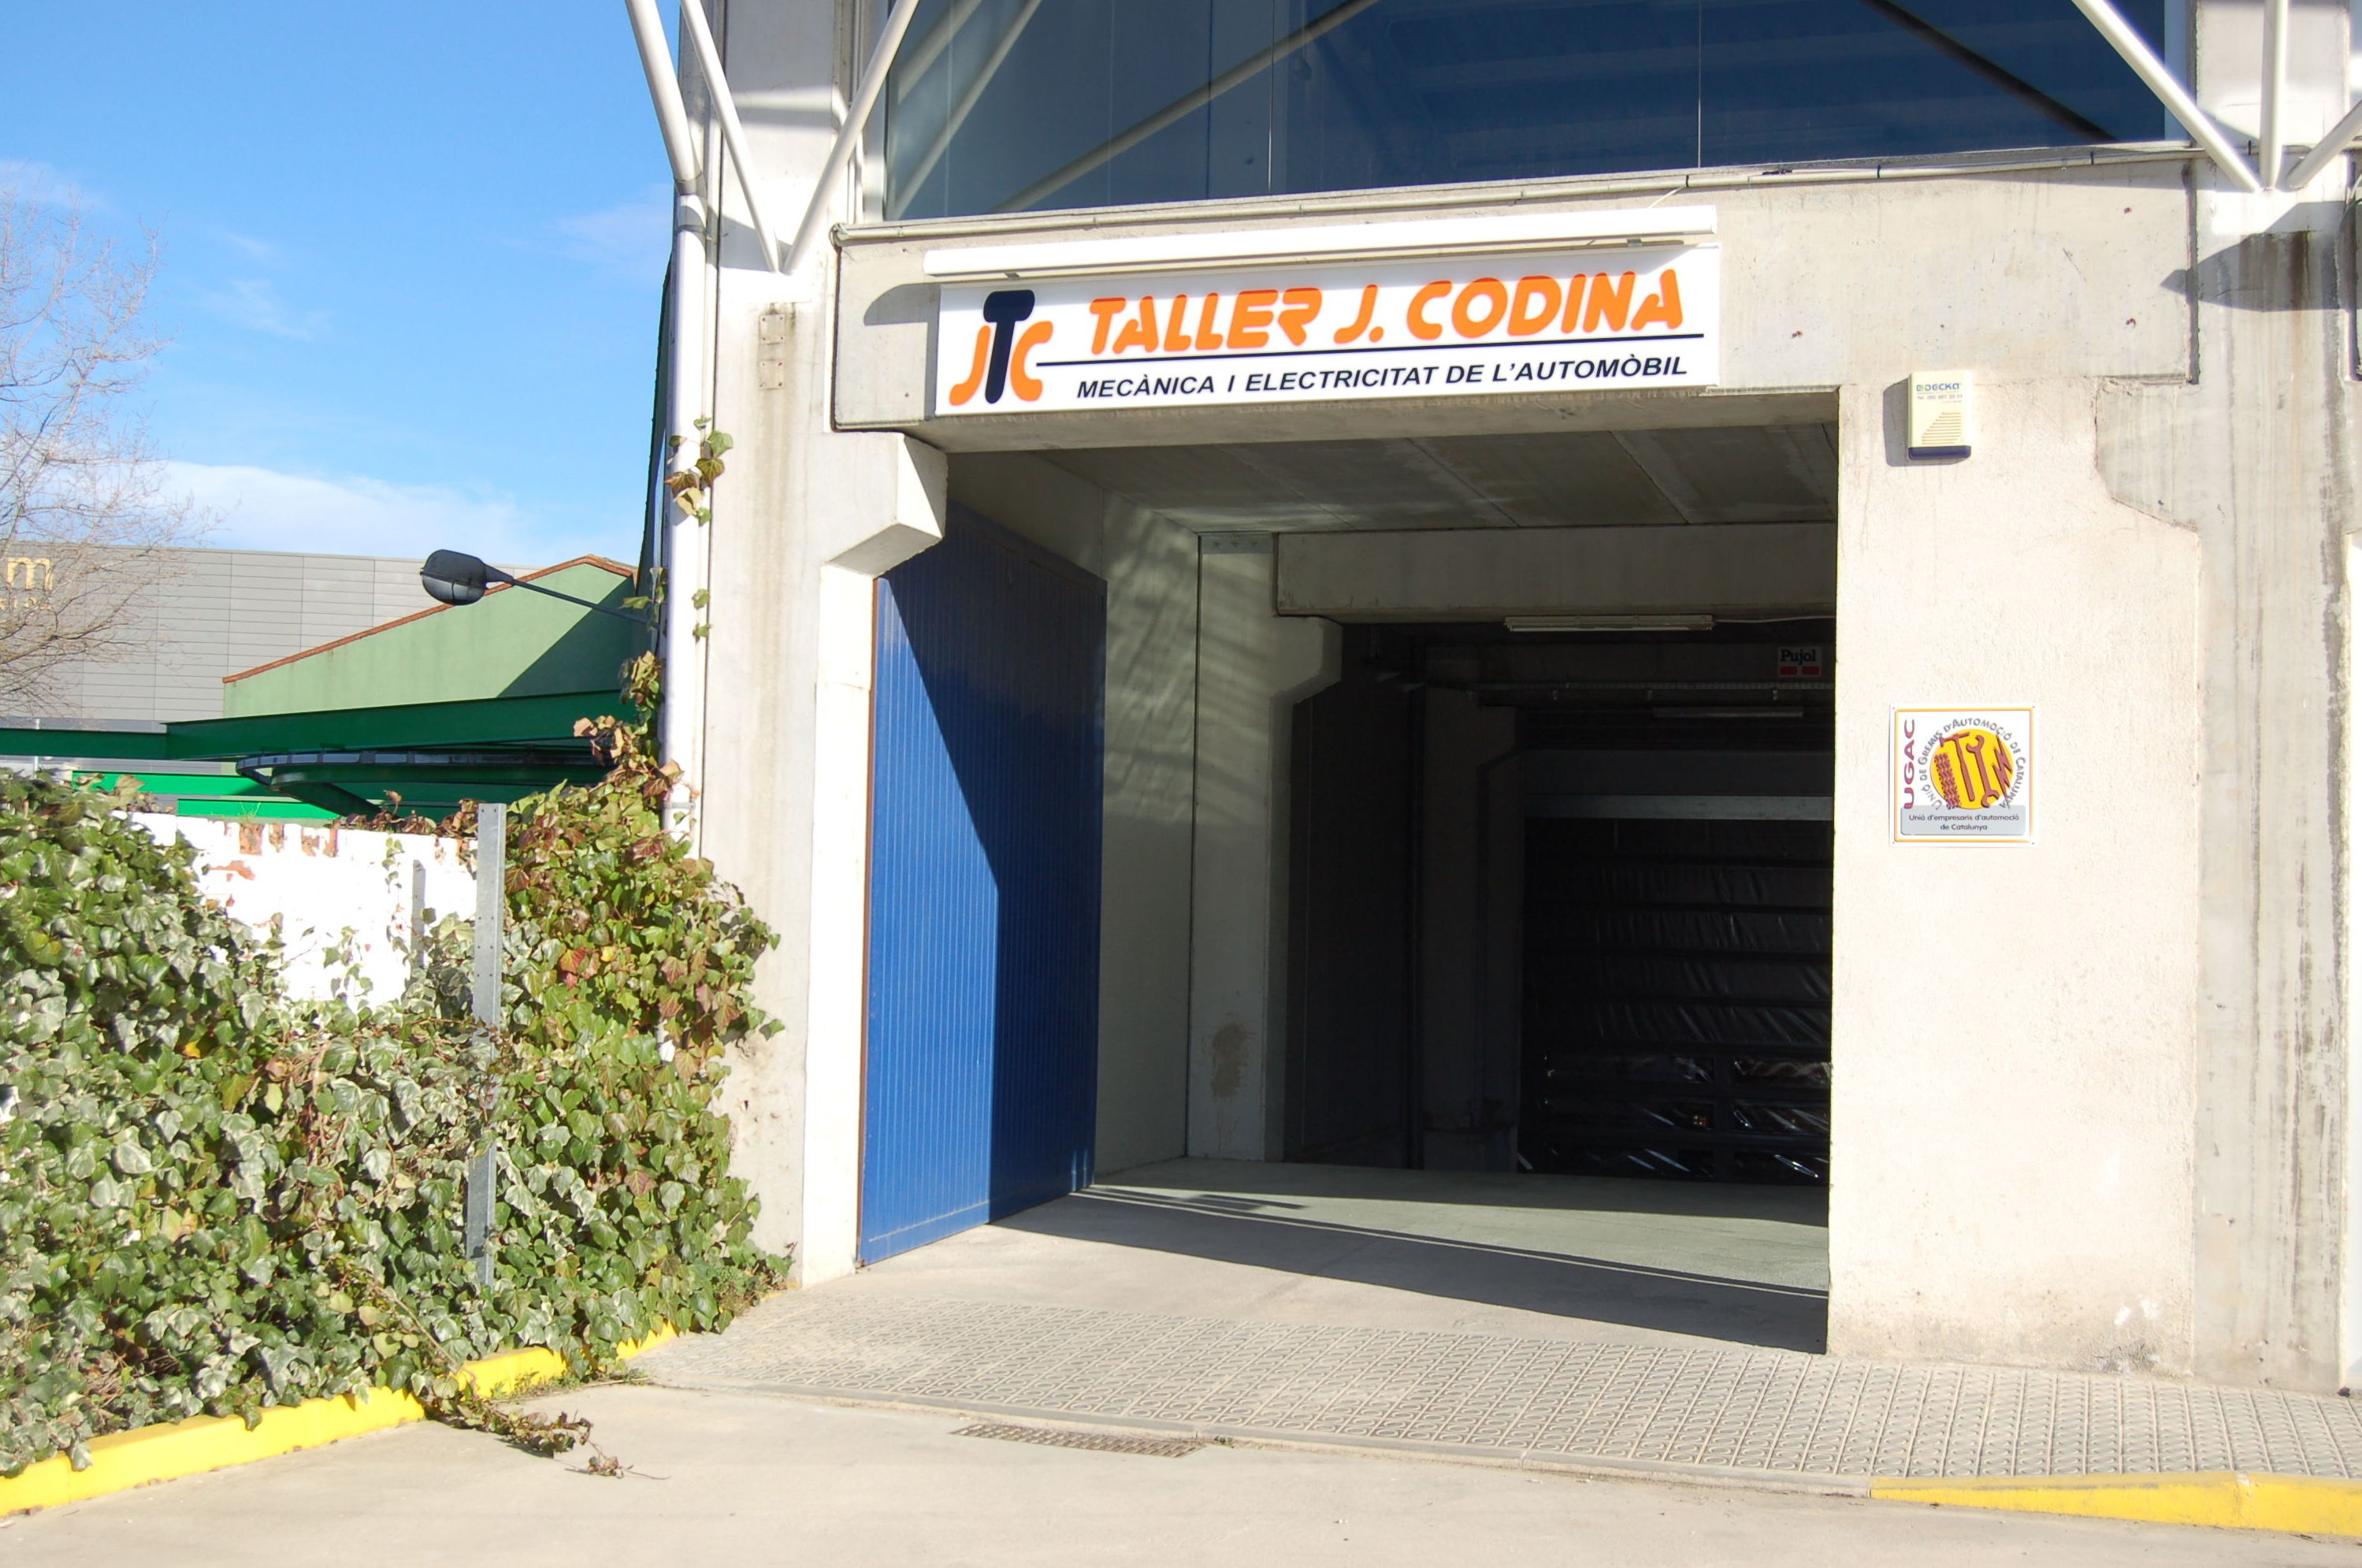 Entrada por Ctra C\u002D35 km 55, (enfrete de la gasolinera) Taller de coches en Sant Celoni.